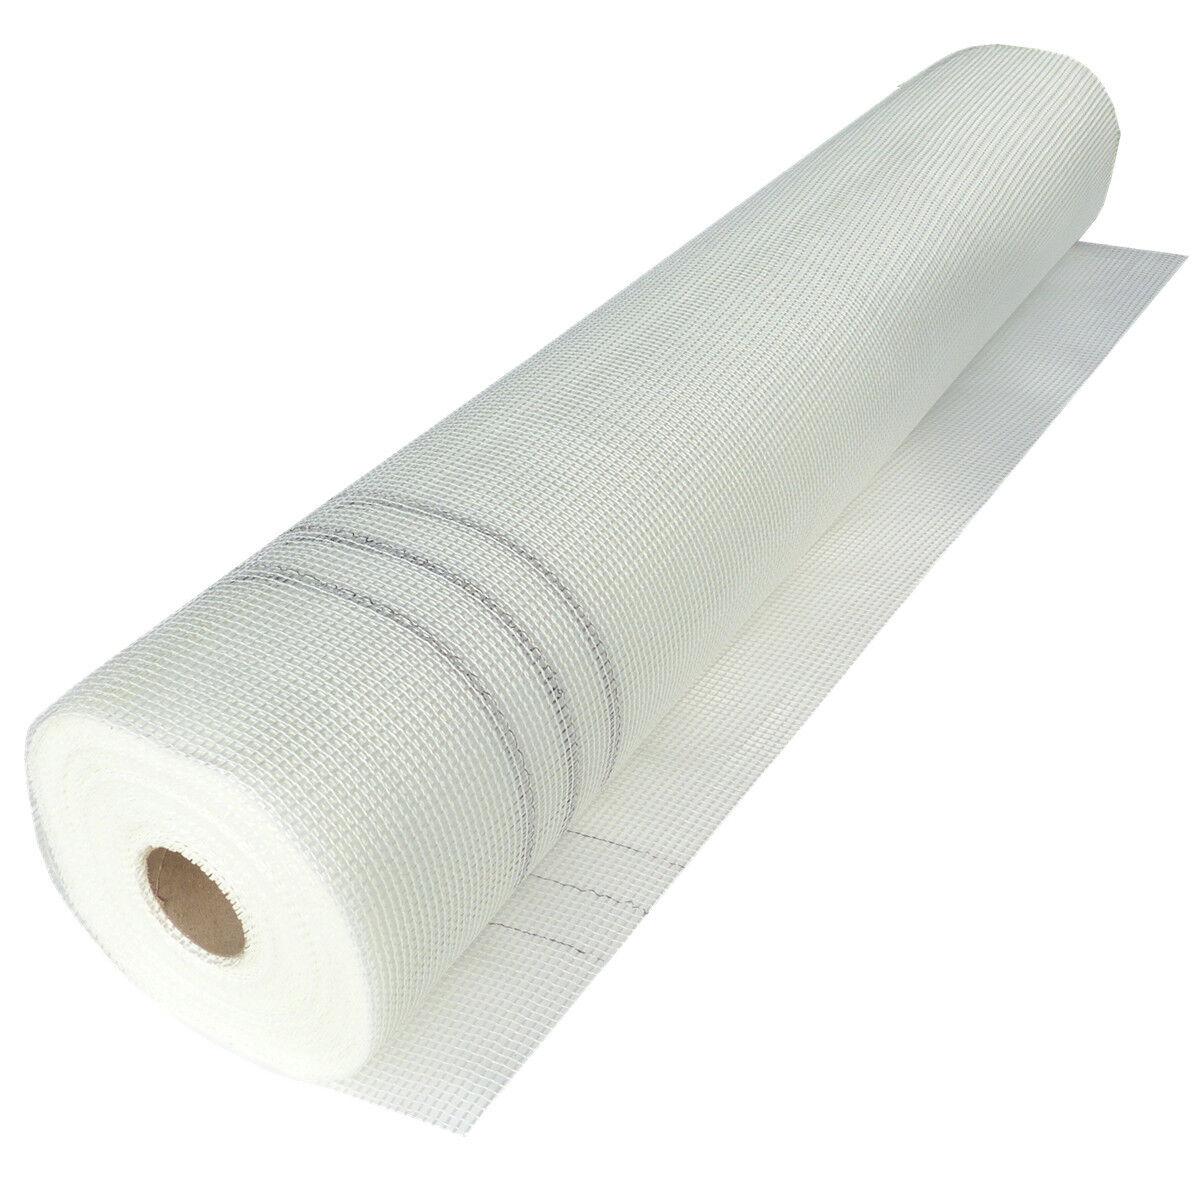 Putzgewebe Armierungsgewebe 4x4mm Glasfaser ca165g m² Fassade Gewebe ( m²)